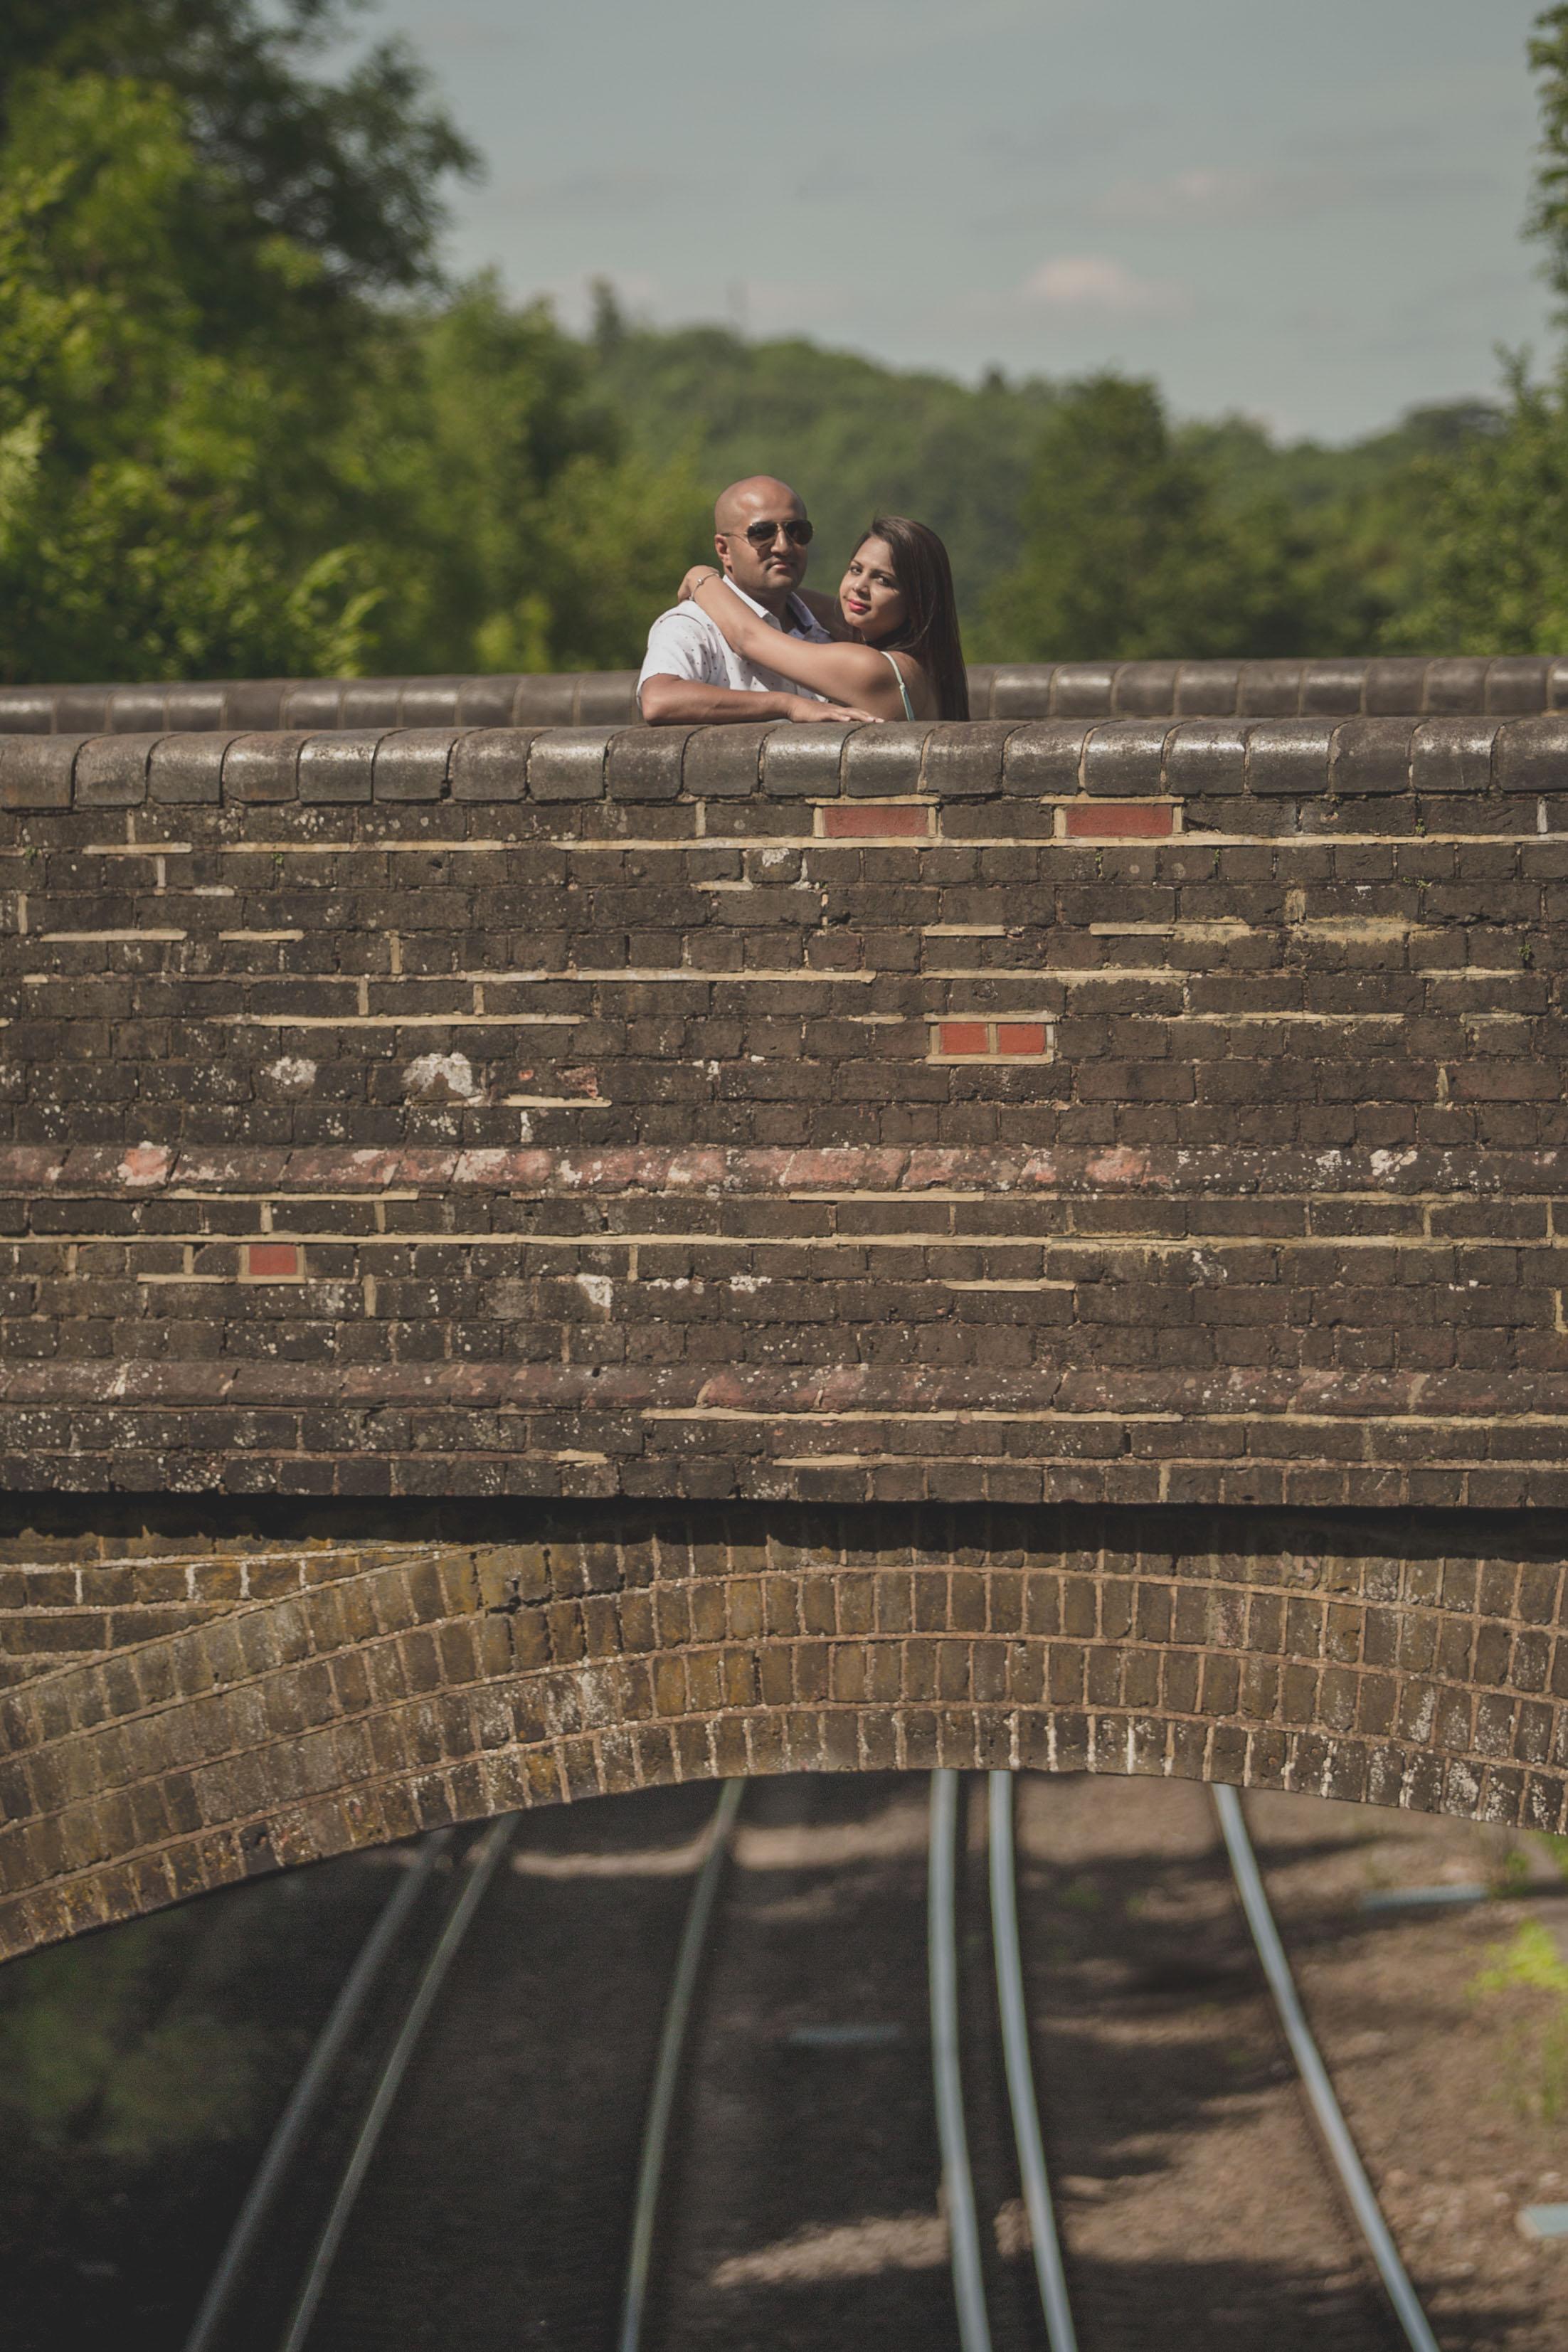 female-asian-wedding-photographer-surrey-hills-box-hill-pre-wedding-prewedding-engagement-photoshoot-shoot-natalia-smith-photography-bridge-13.jpg